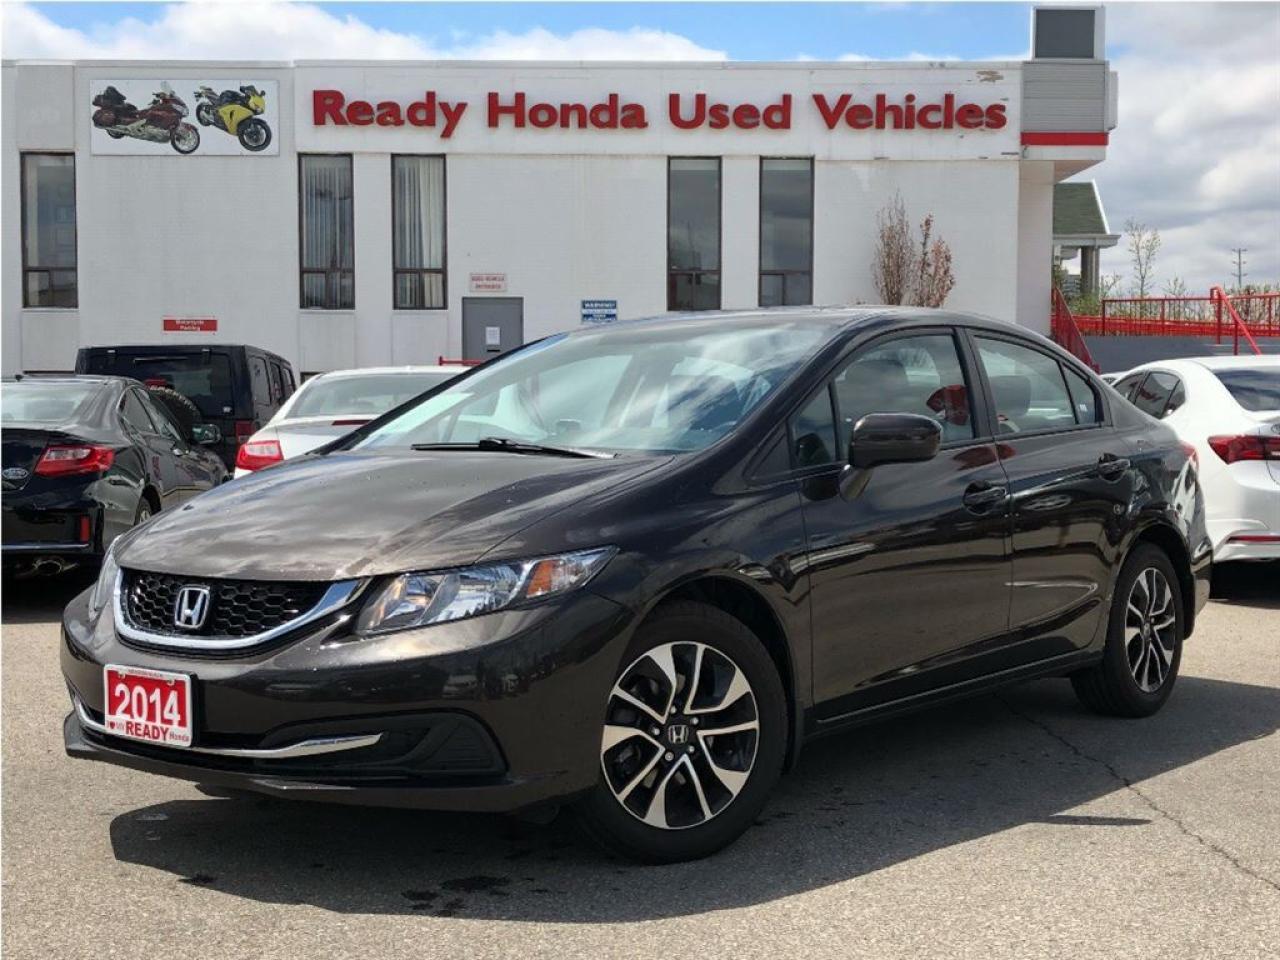 Photo of Brown 2014 Honda Civic